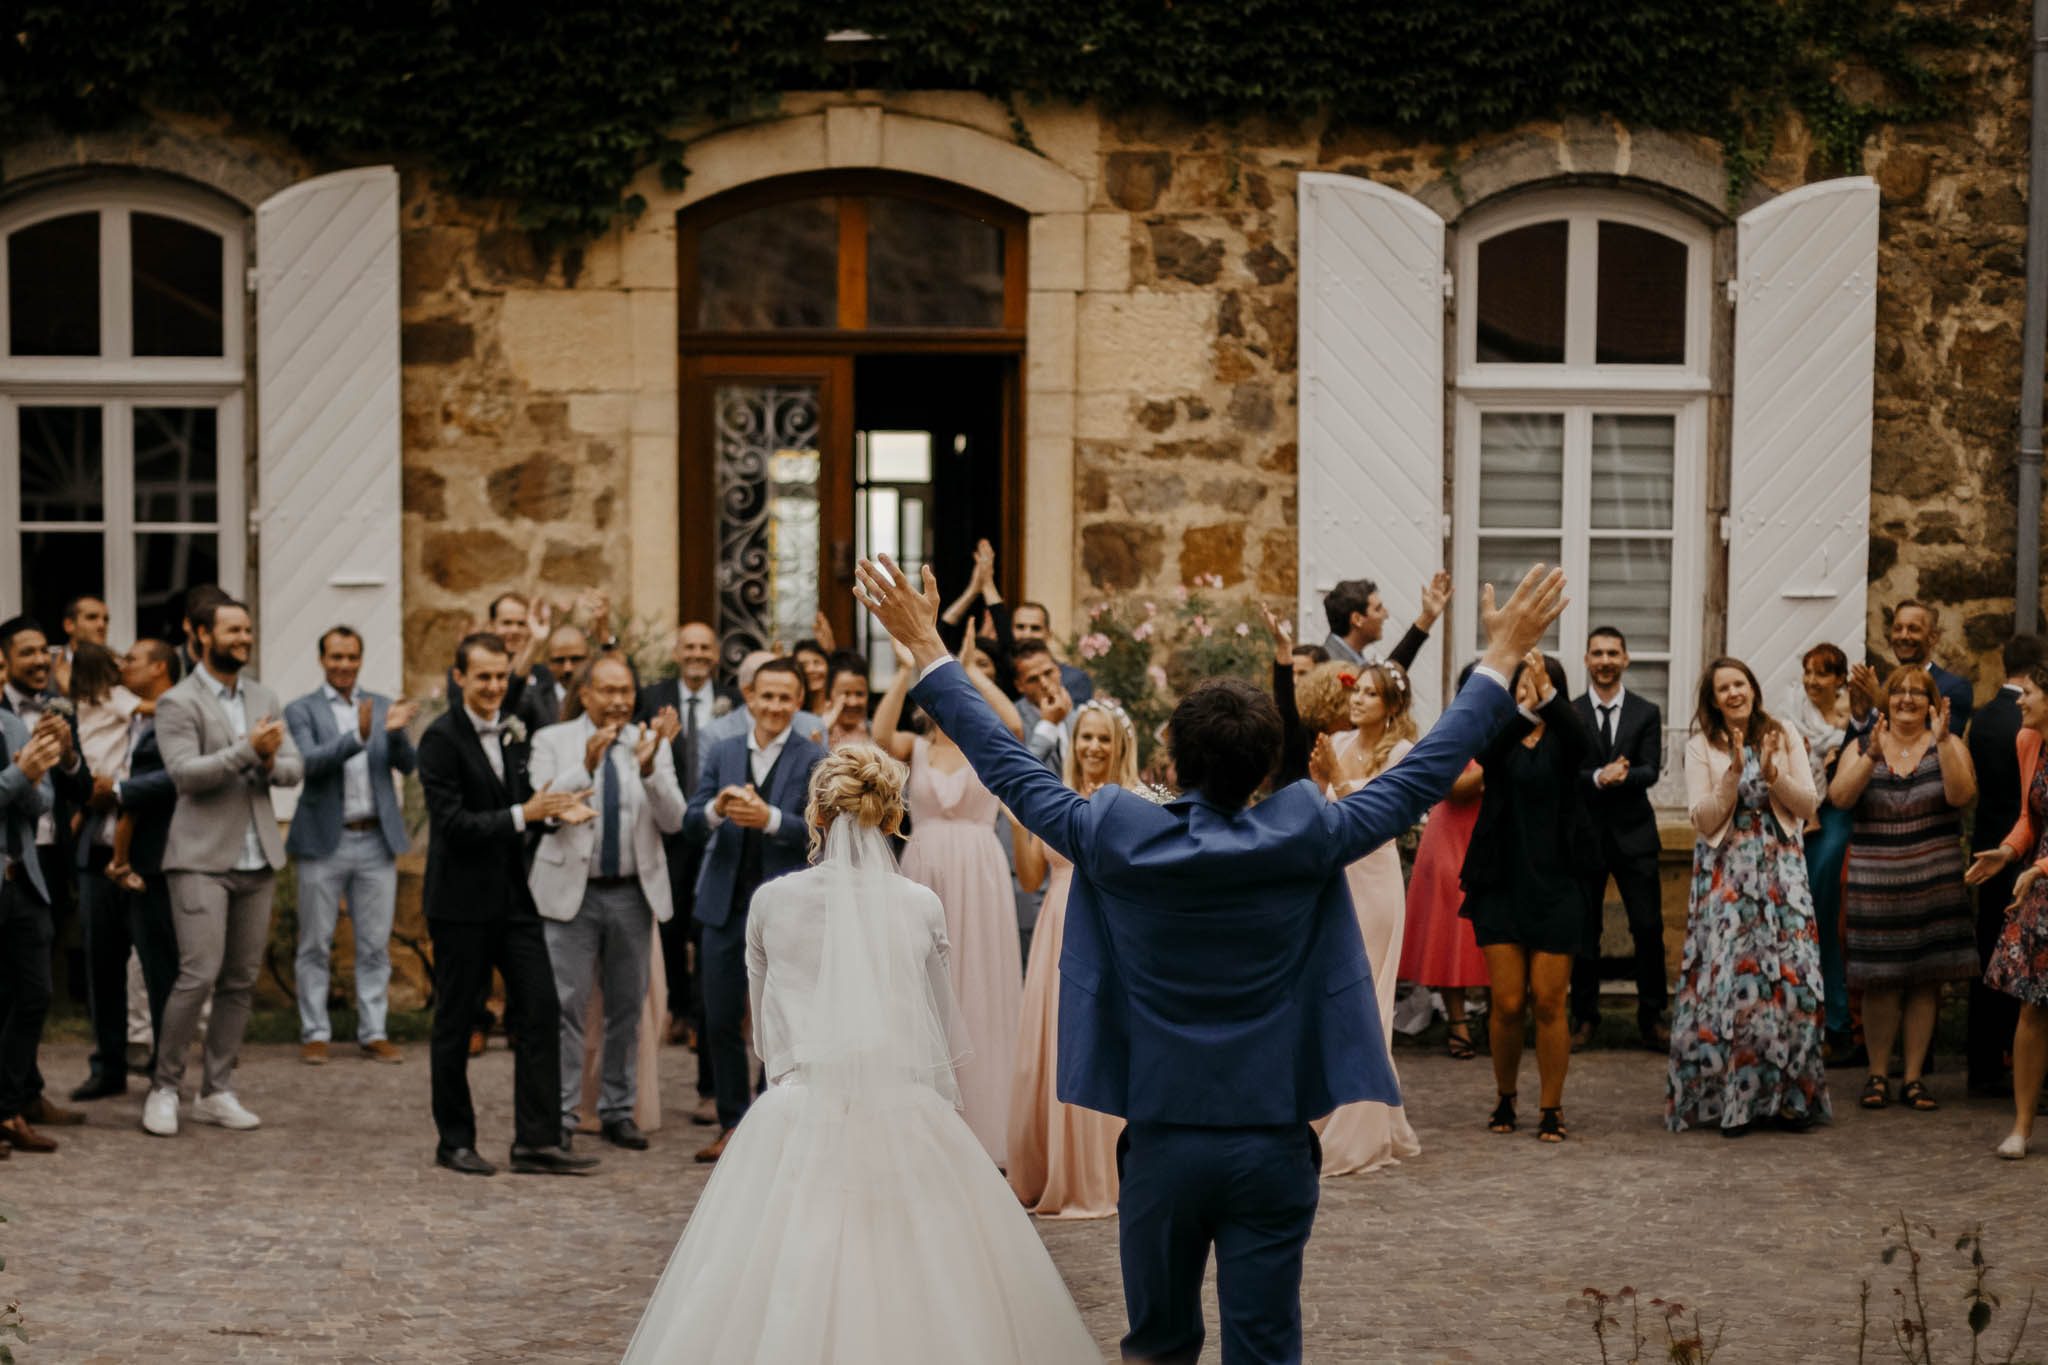 mariage-chateau-gaudras-ingold-87.jpg